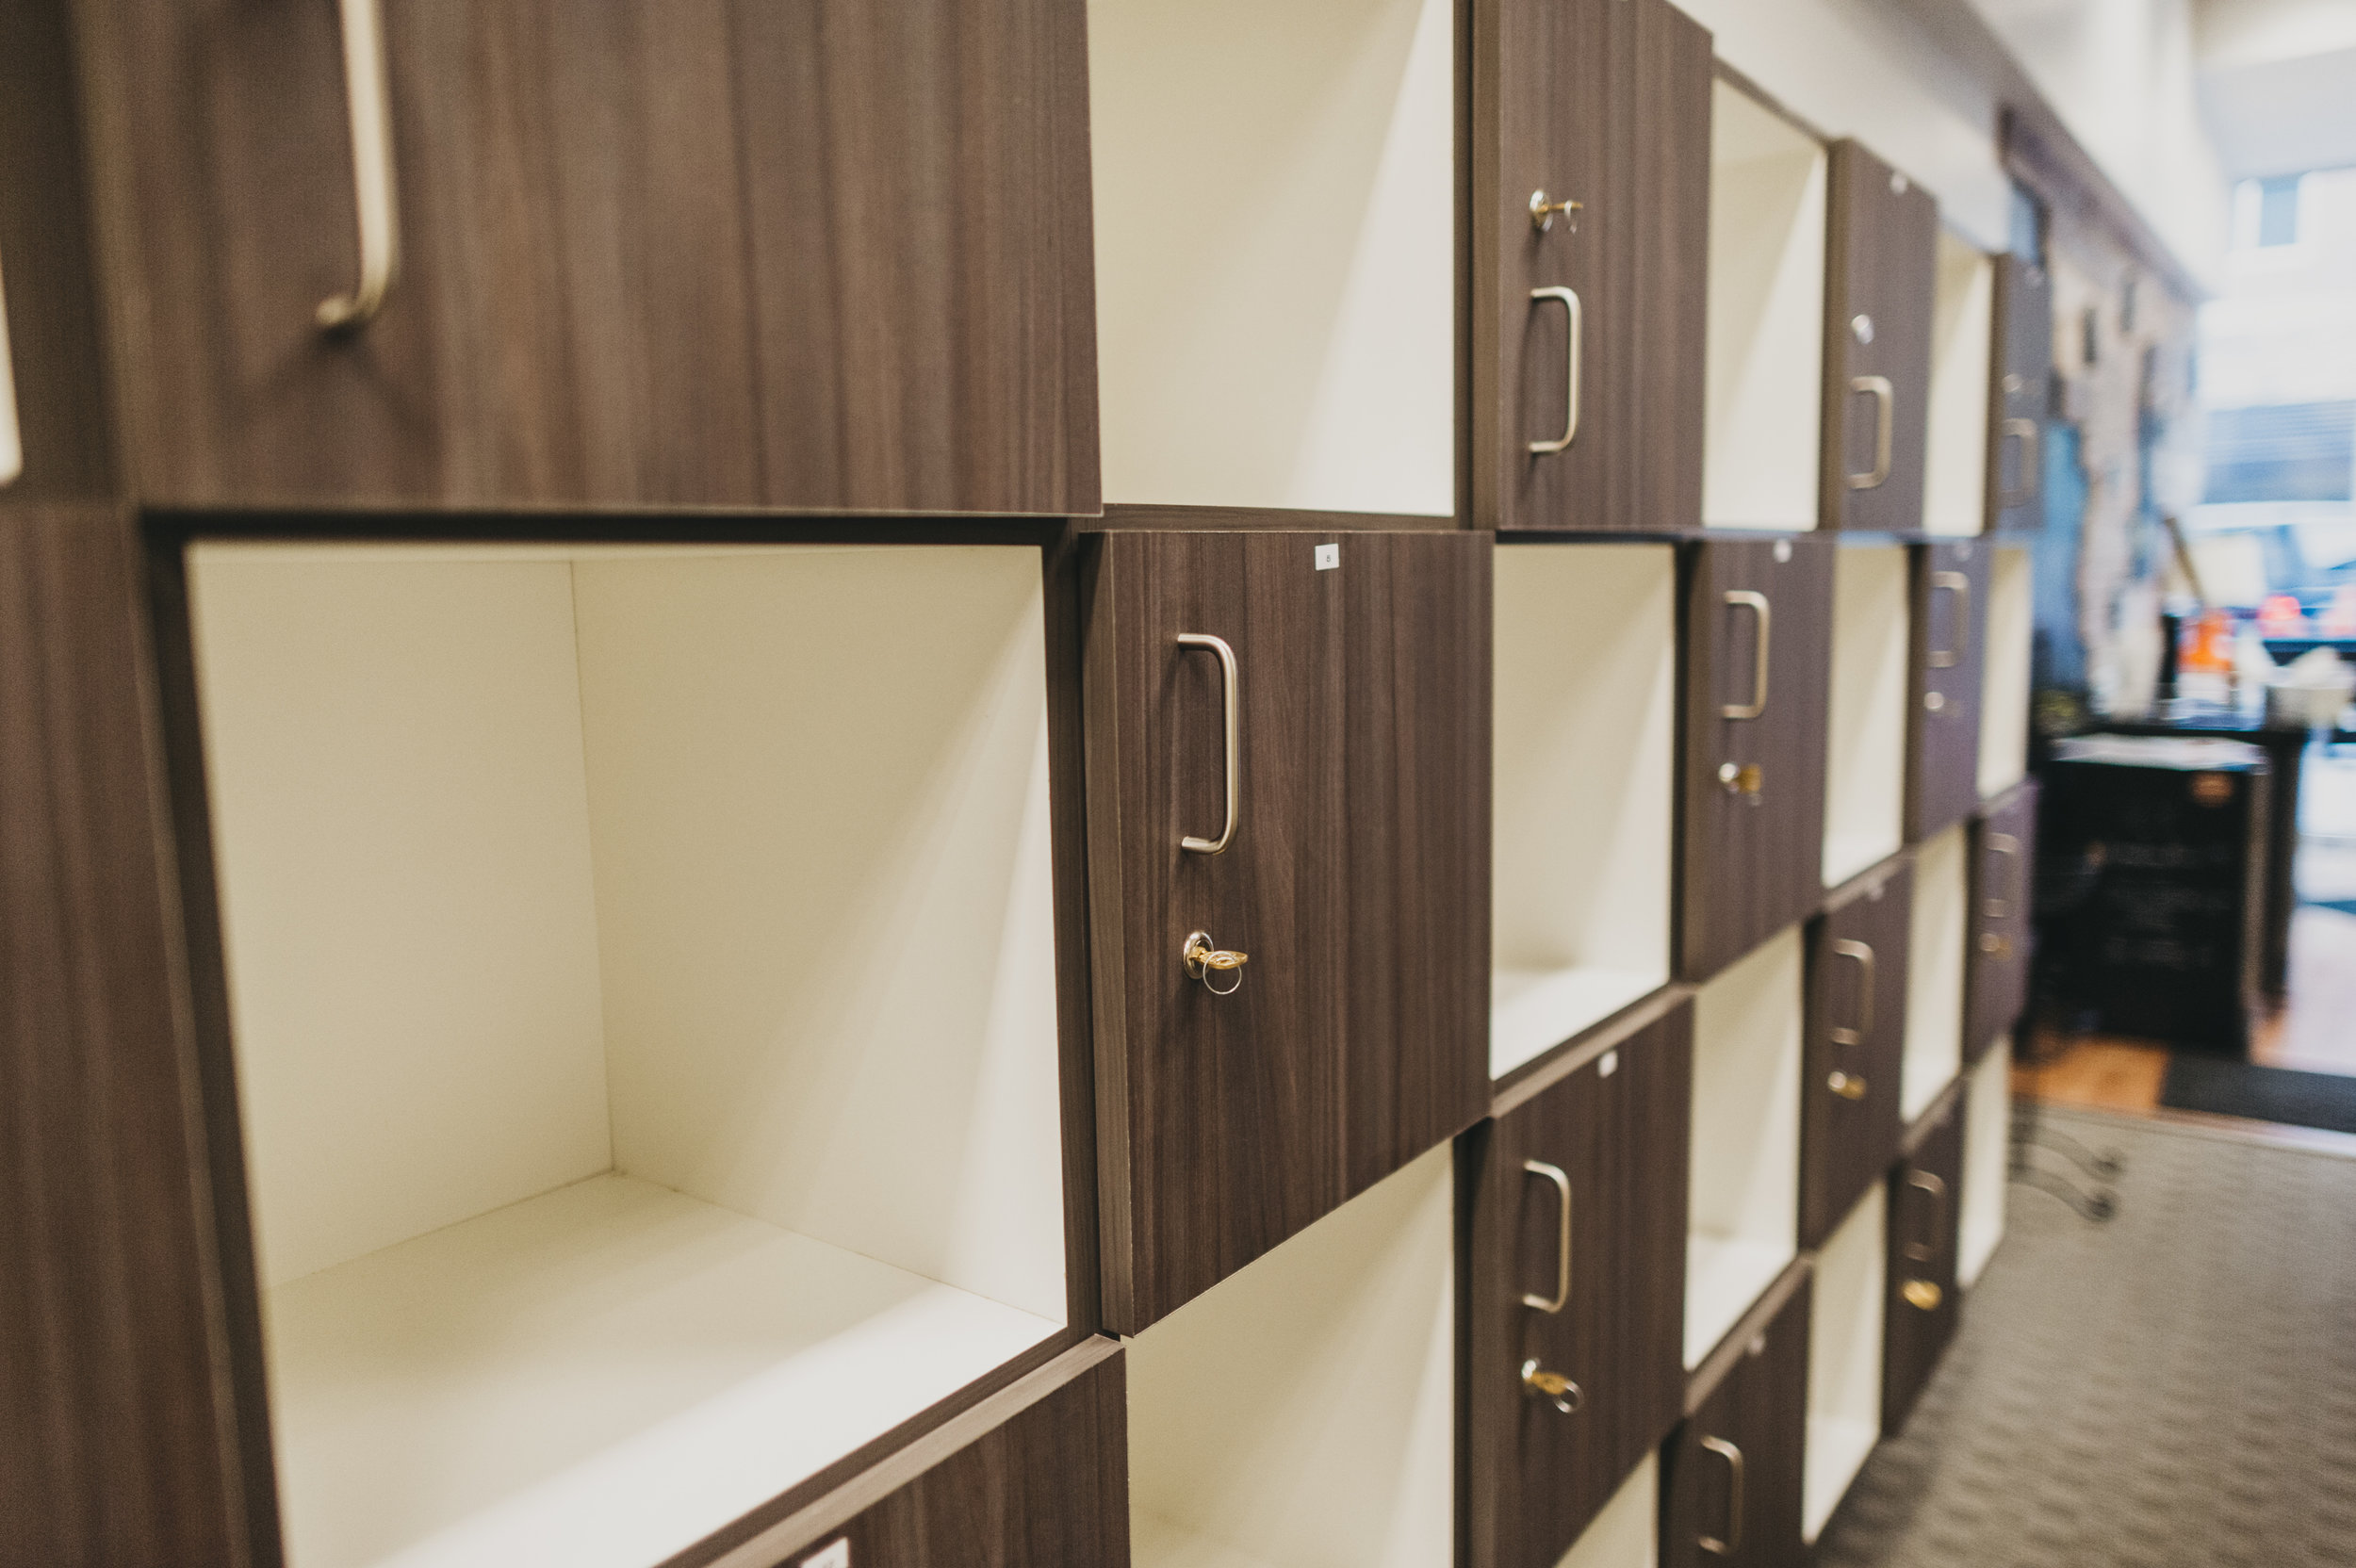 Store your belongings in a cubby or locker